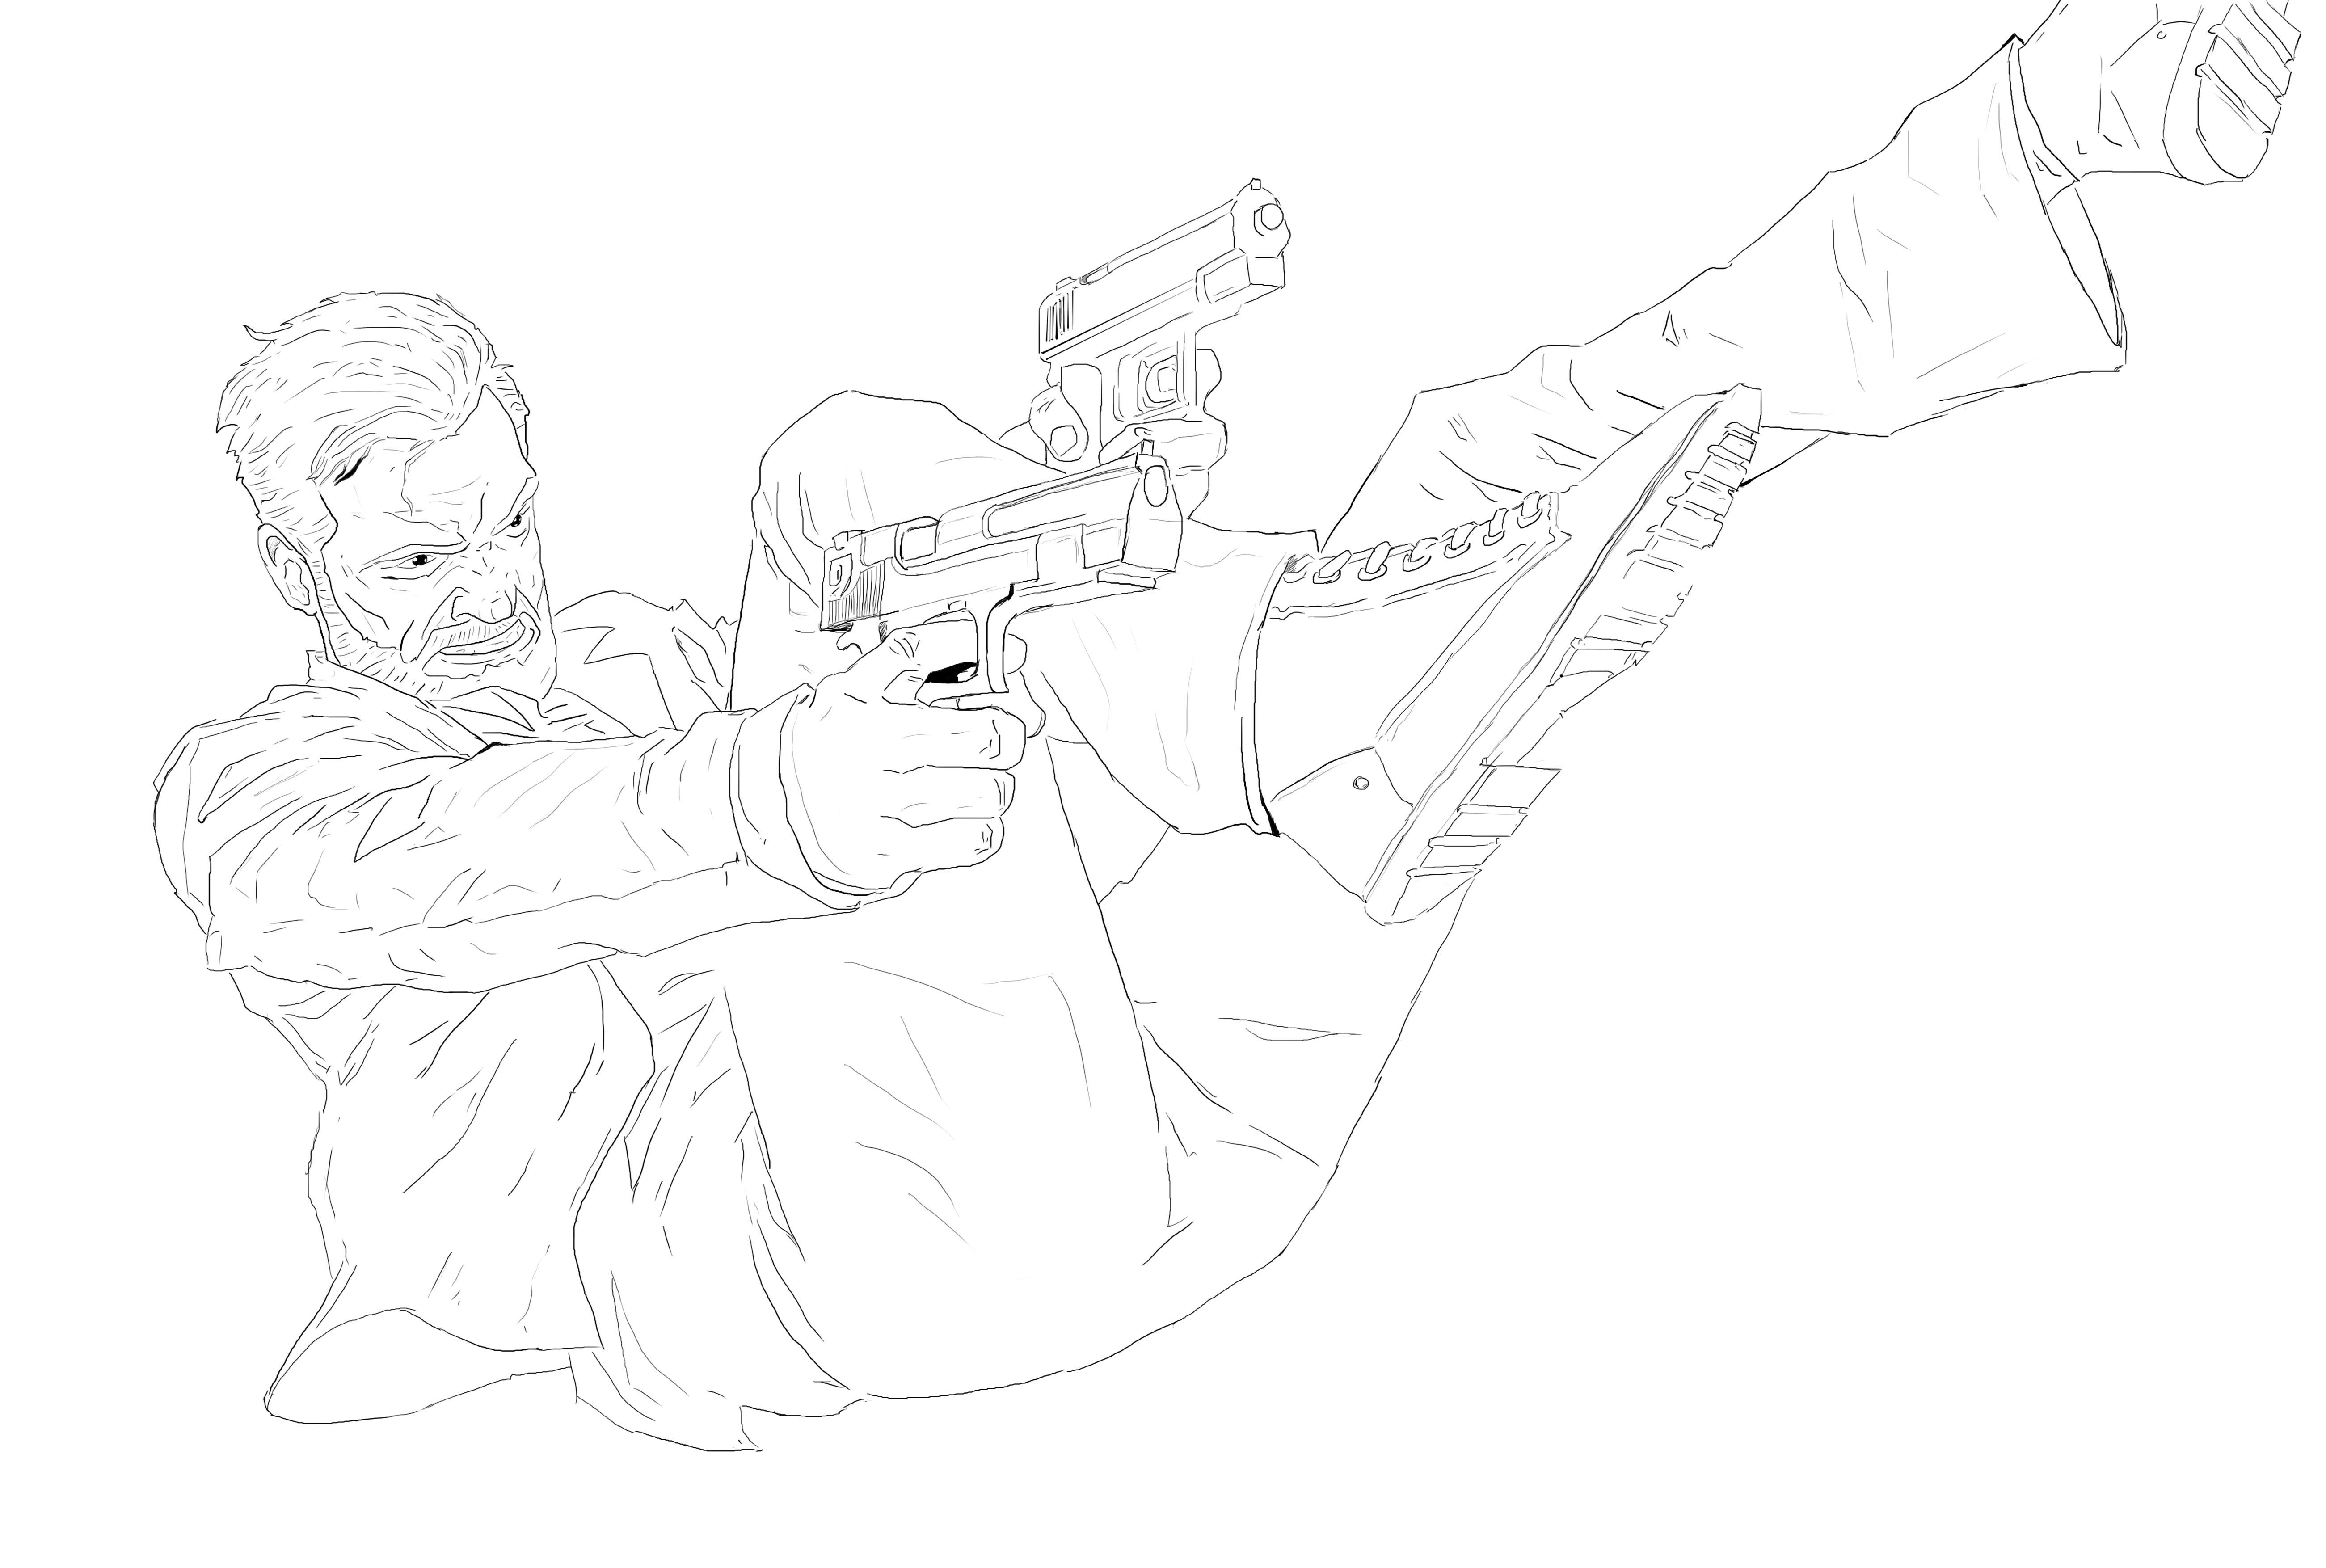 Max Payne 3 sketch